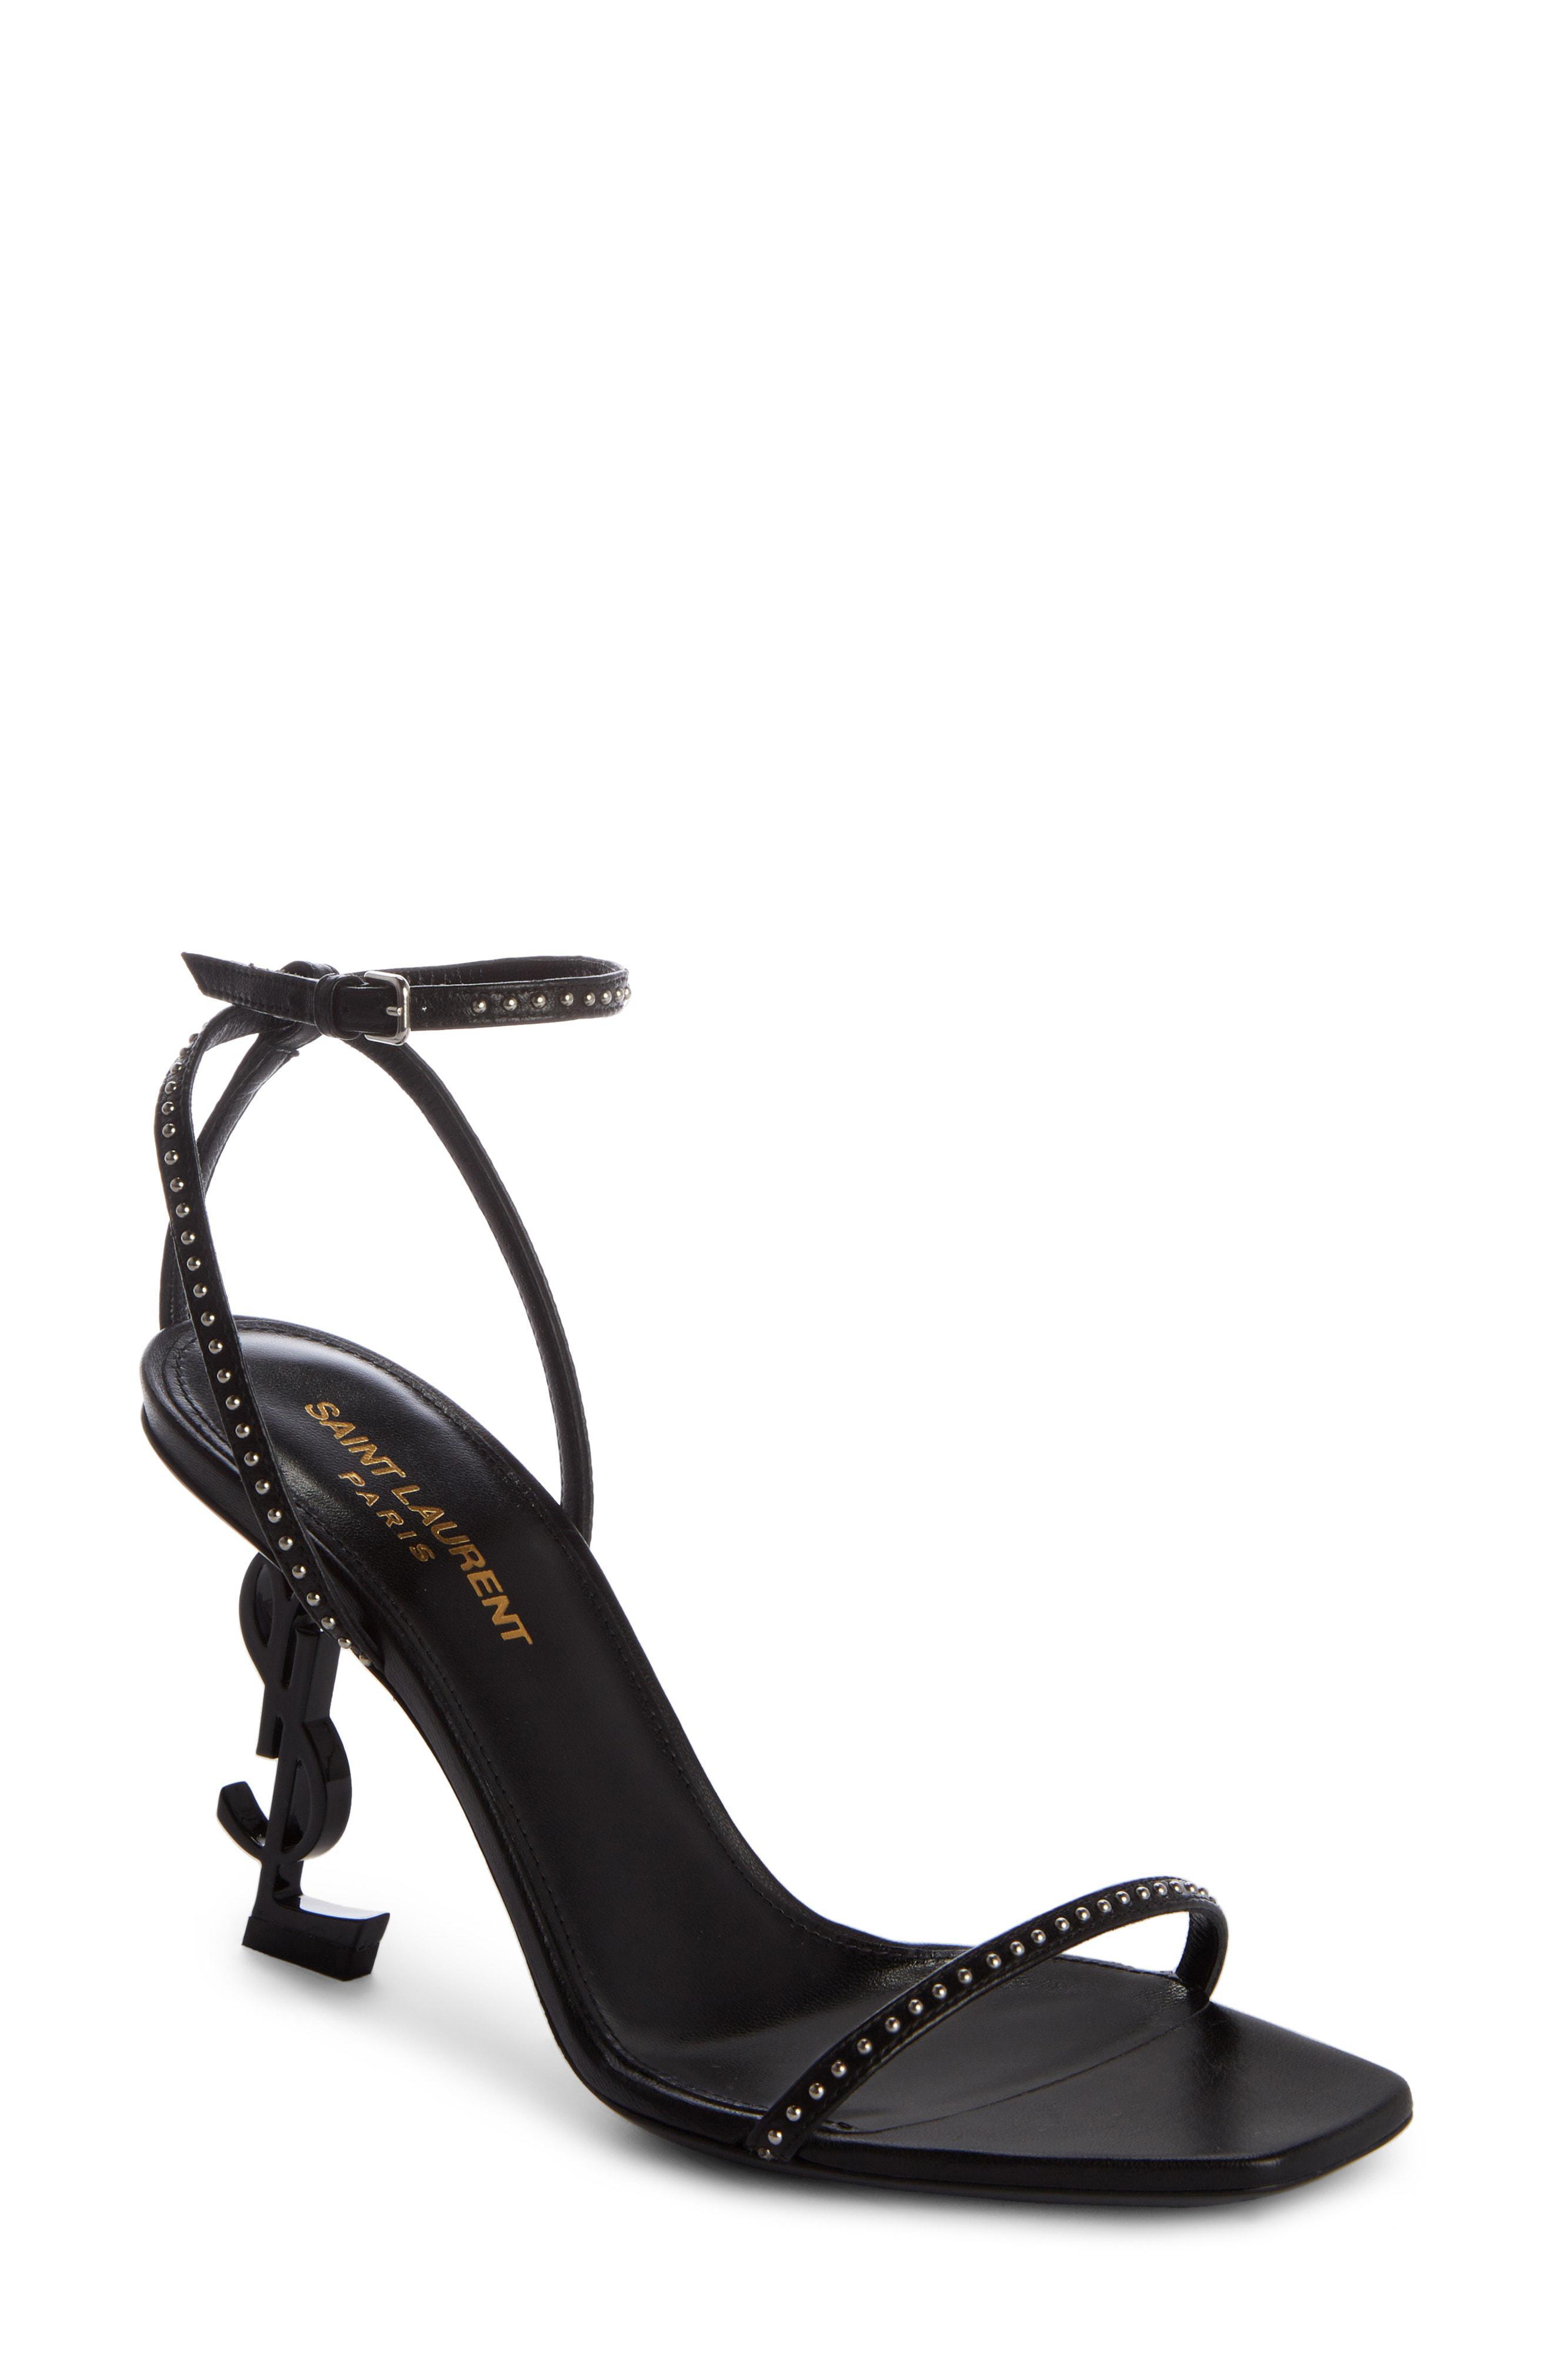 34f739c62aa6 Lyst - Saint Laurent Opyum Ysl Studded Ankle Strap Sandal in Black